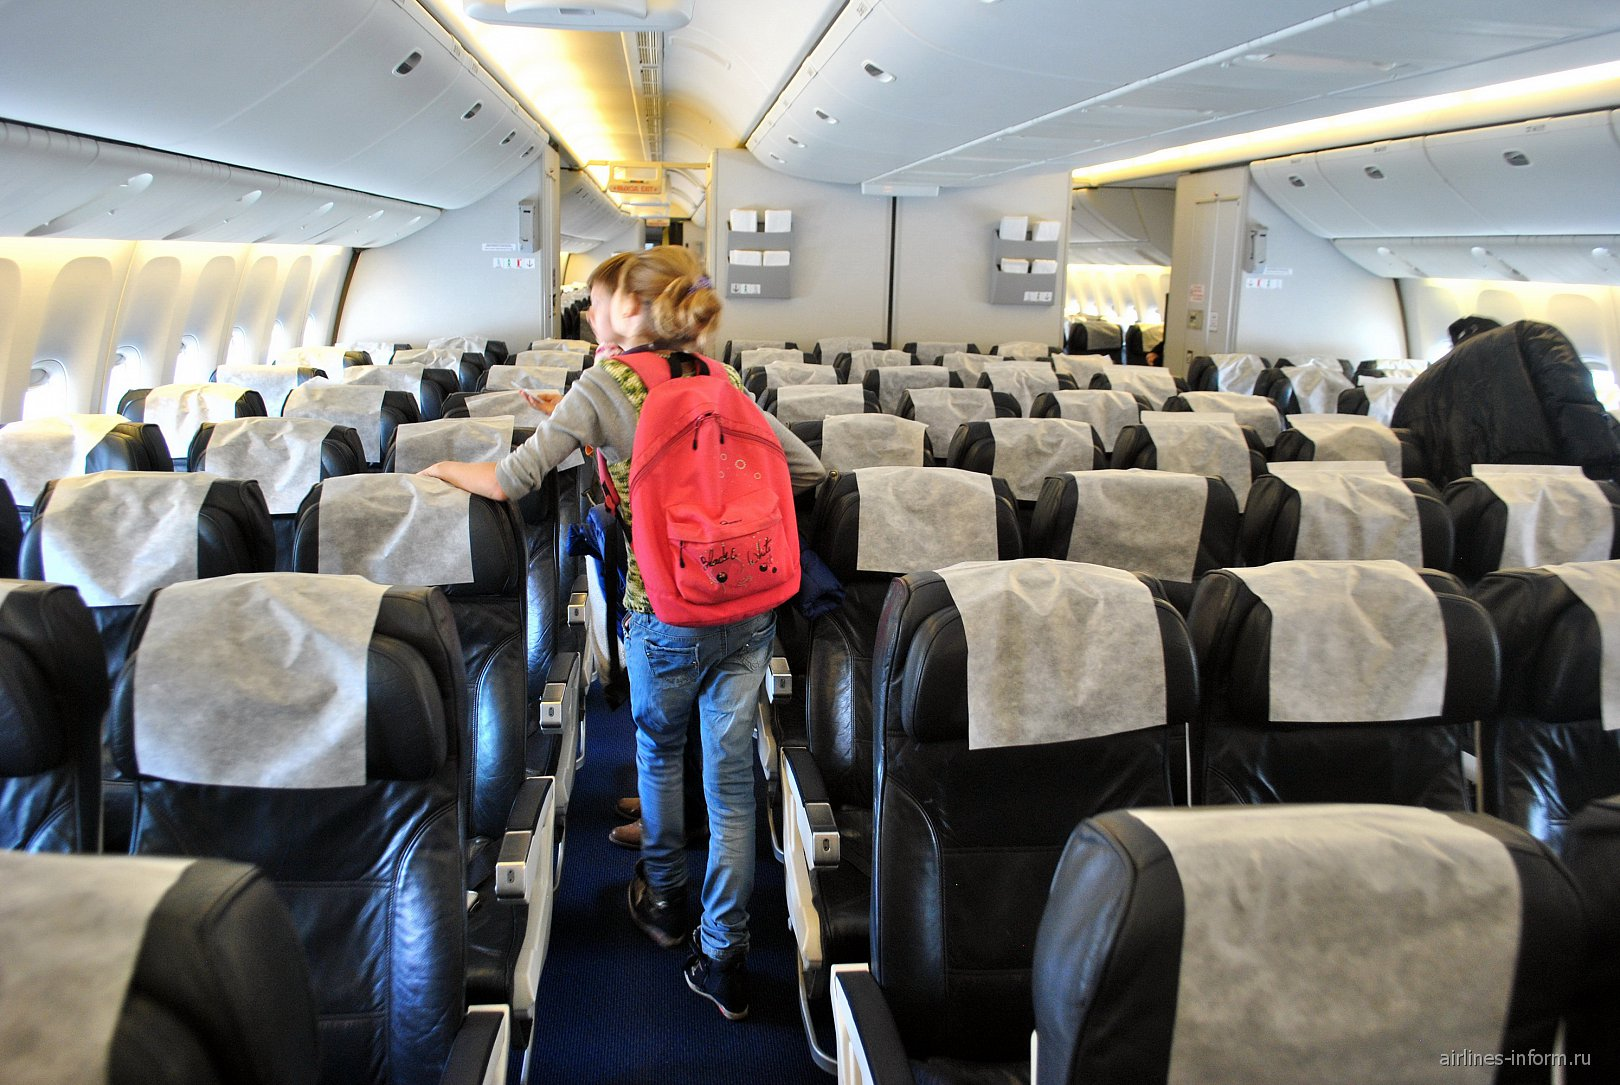 Салон самолета Боинг-777-200 Оренбургских авиалиний